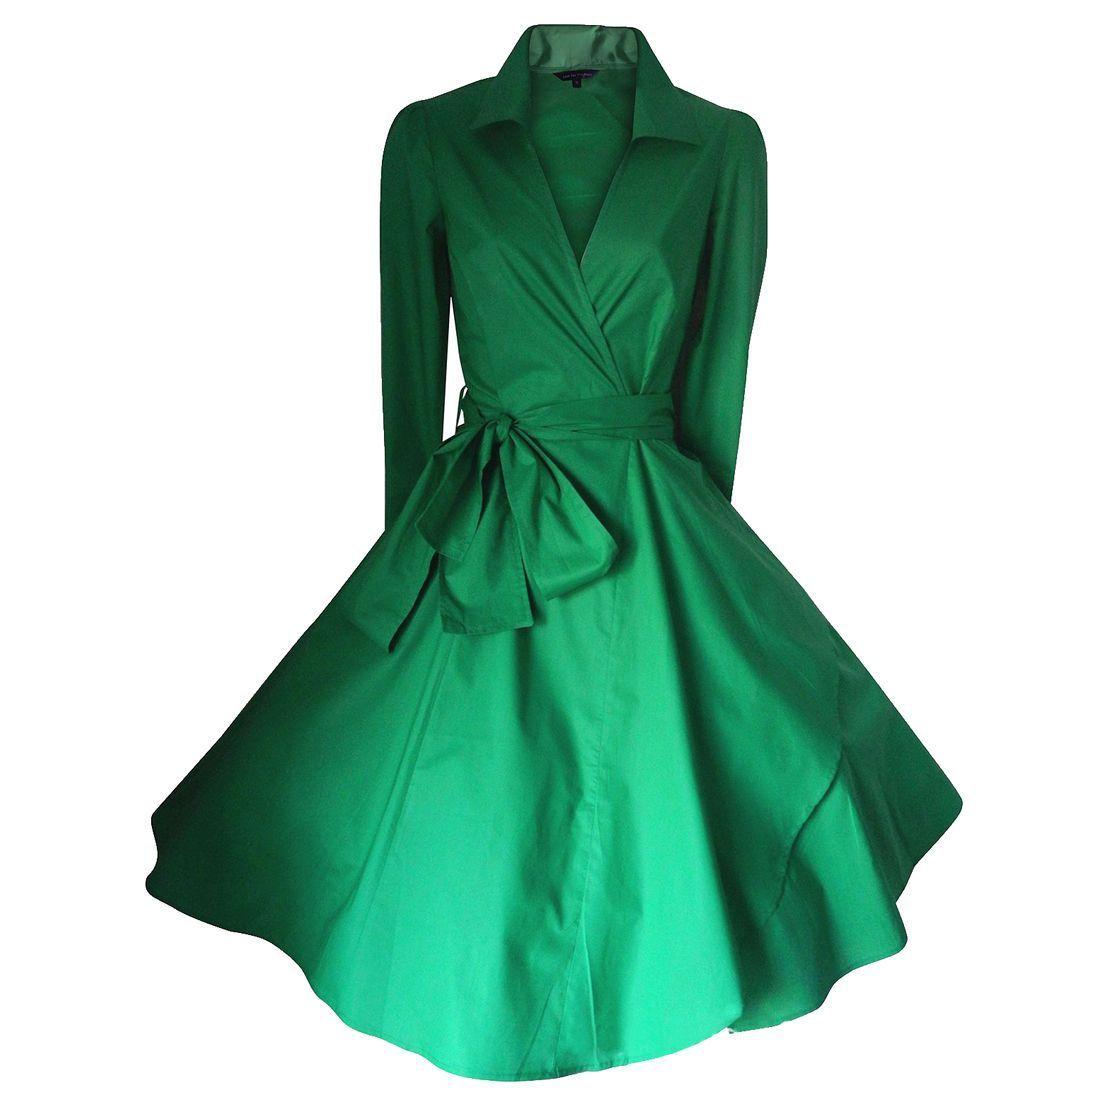 Womenus vintage s s shirtwaist flared dress swing skaters wrap